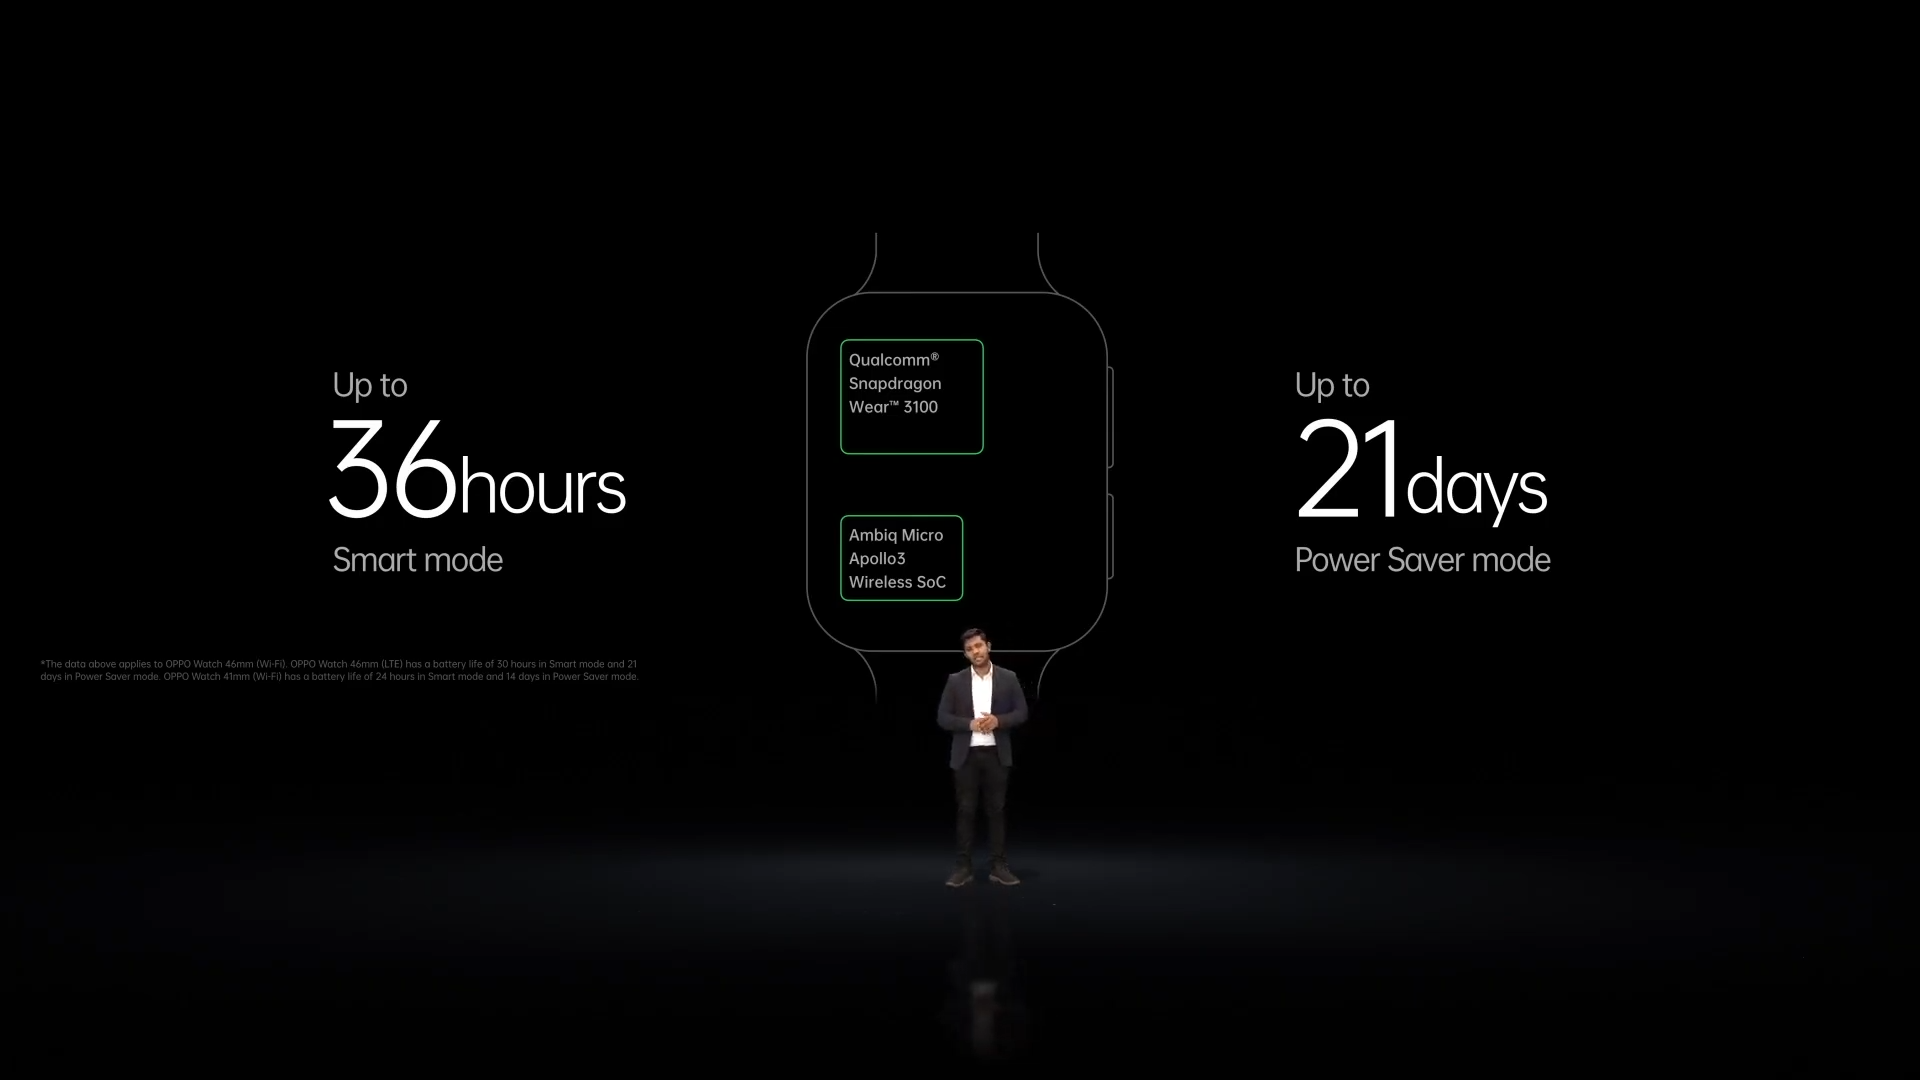 Oppo Watch在印度推出,具有弧形AMOLED显示屏,续航时间长达21天